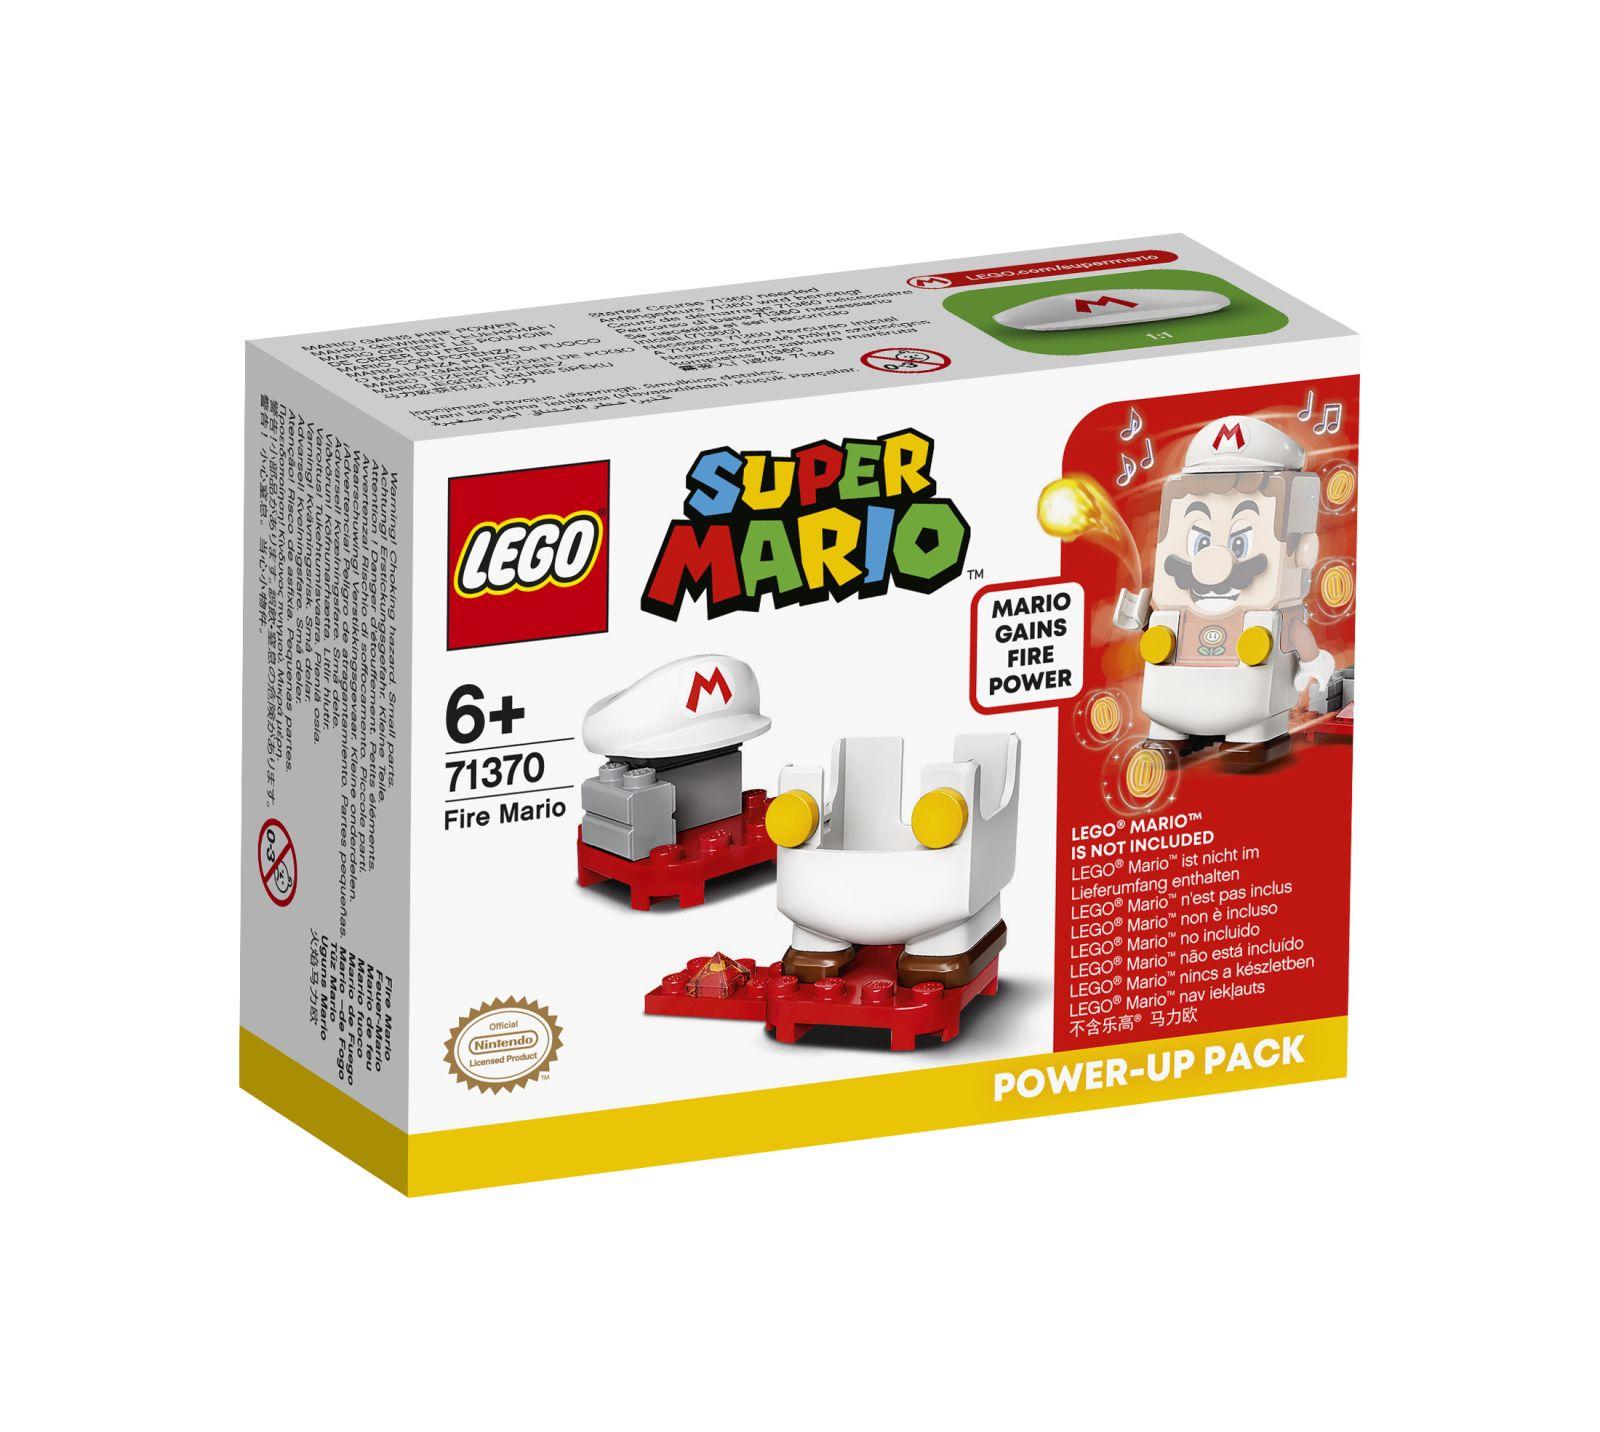 Lego super mario mario fuoco - power up pack - 71370 - Super Mario